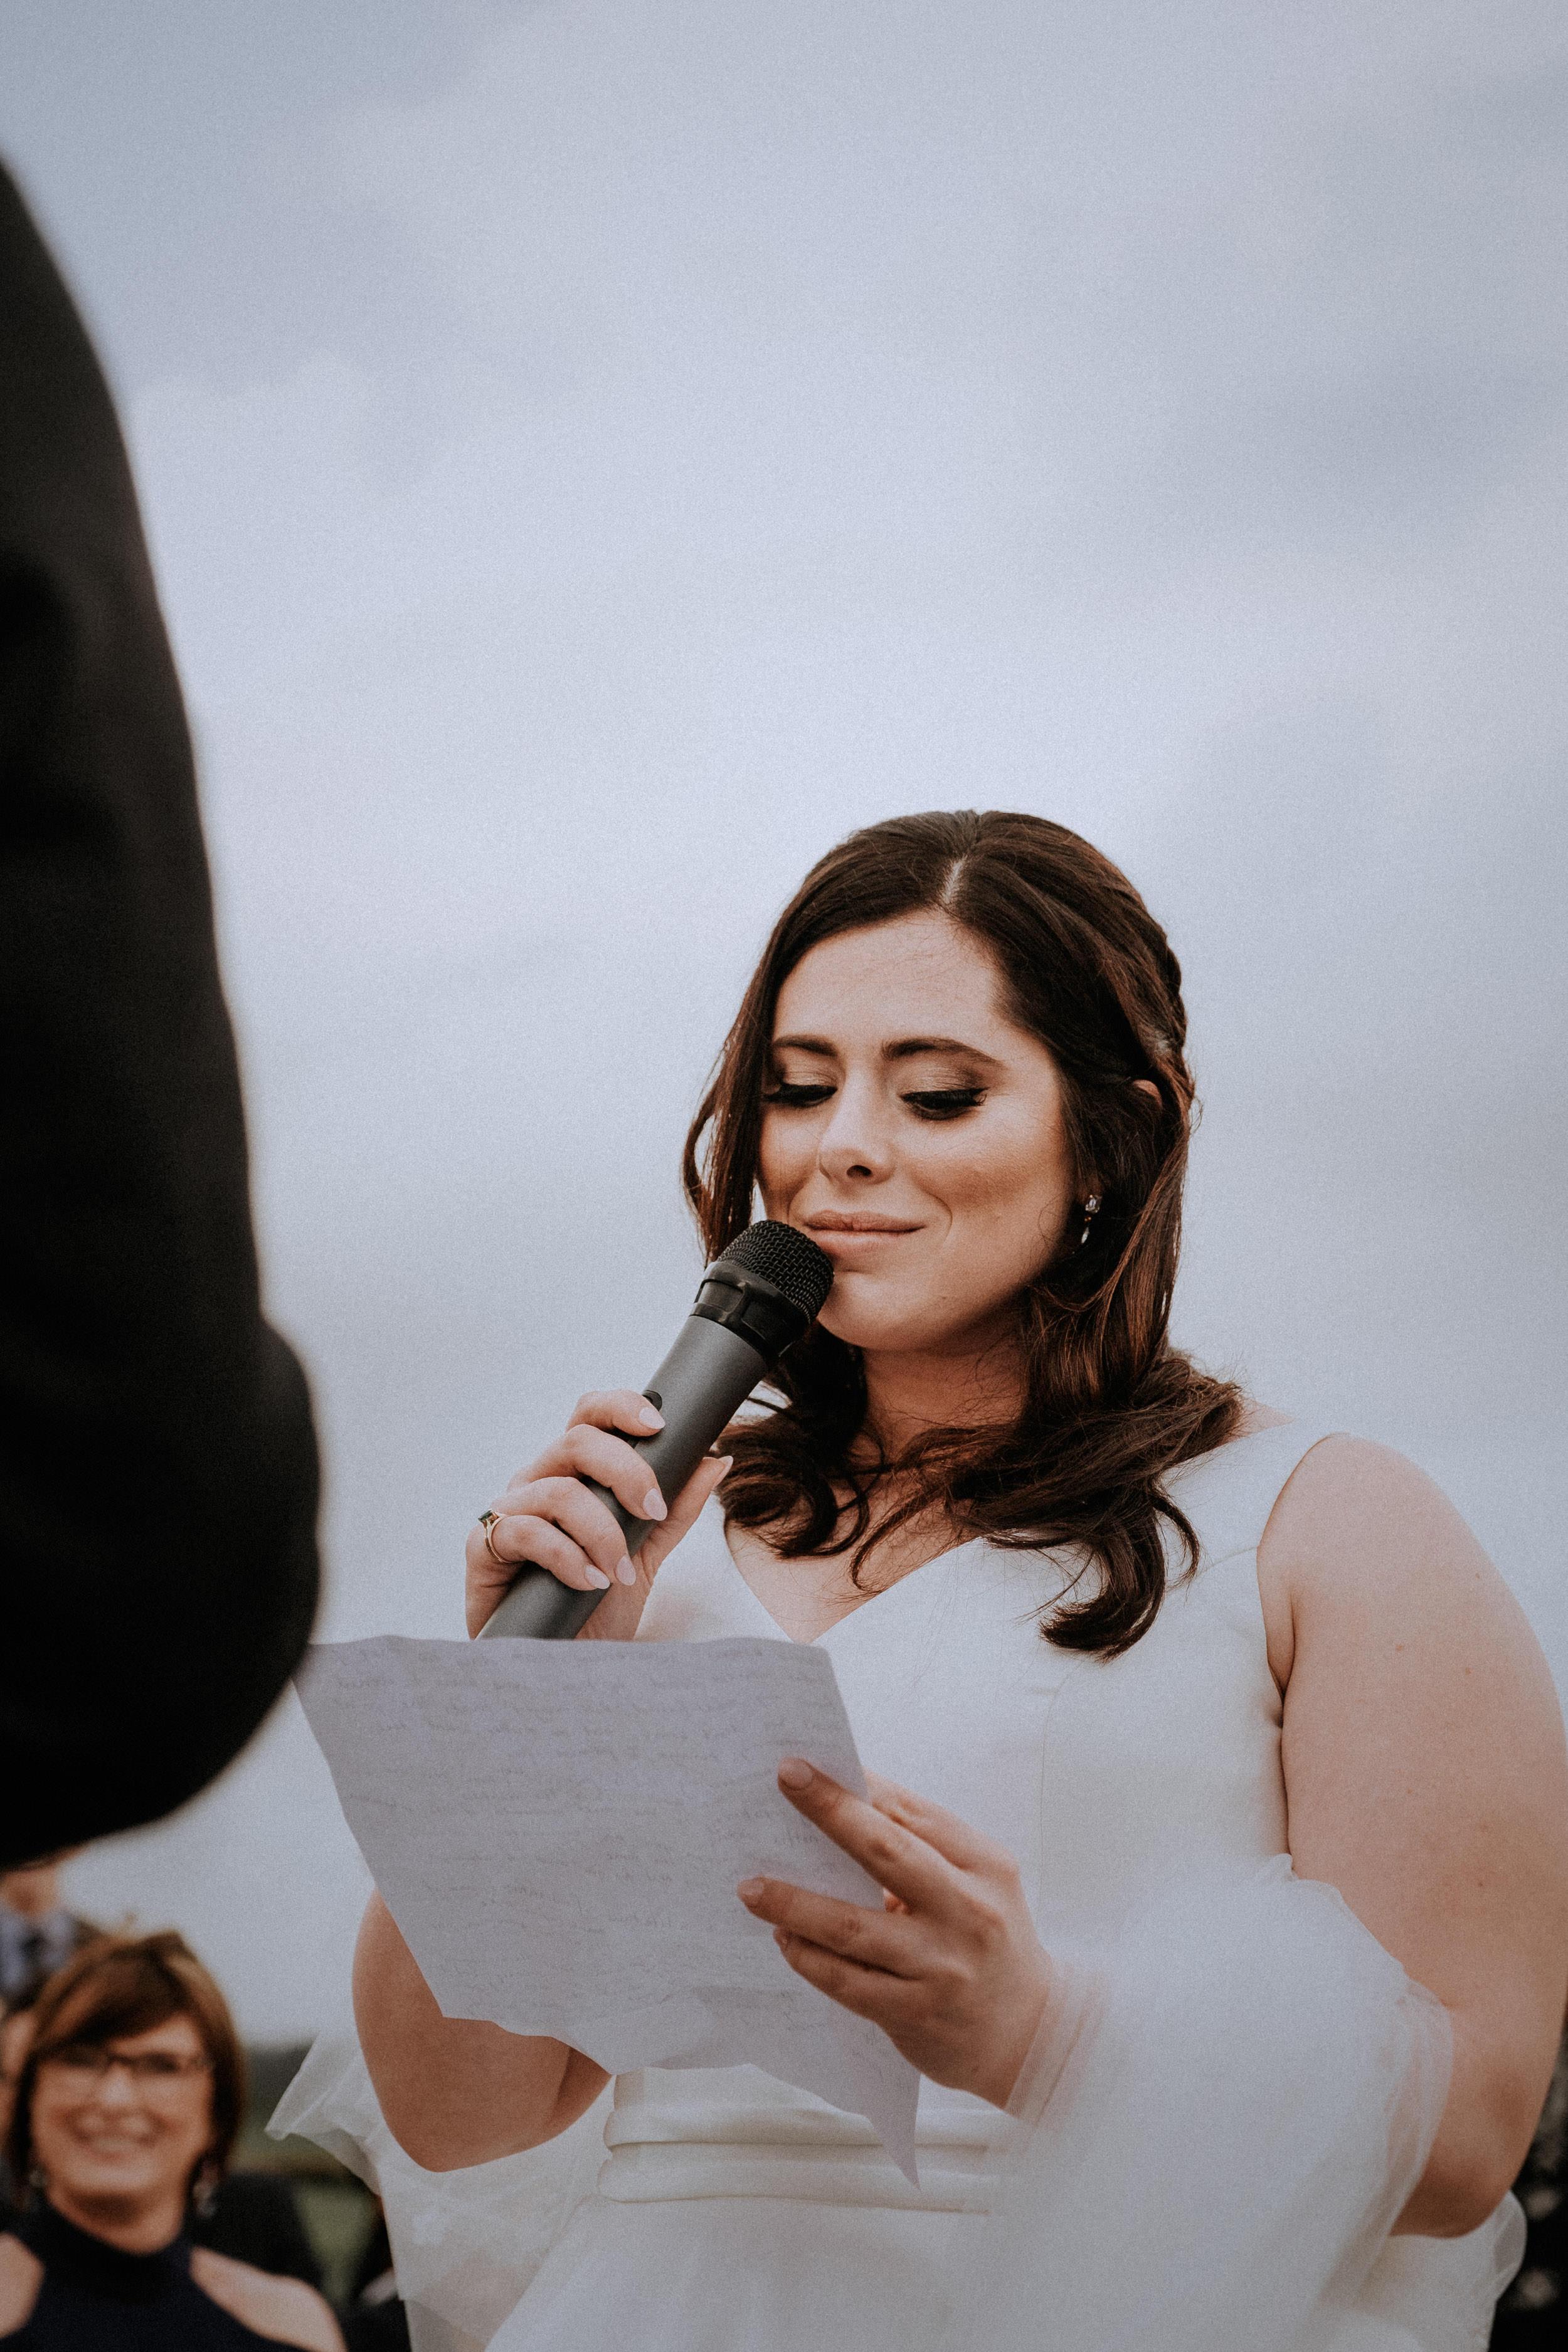 s+j_top_elopement wedding photography_kings & thieves_blog - 283.jpg